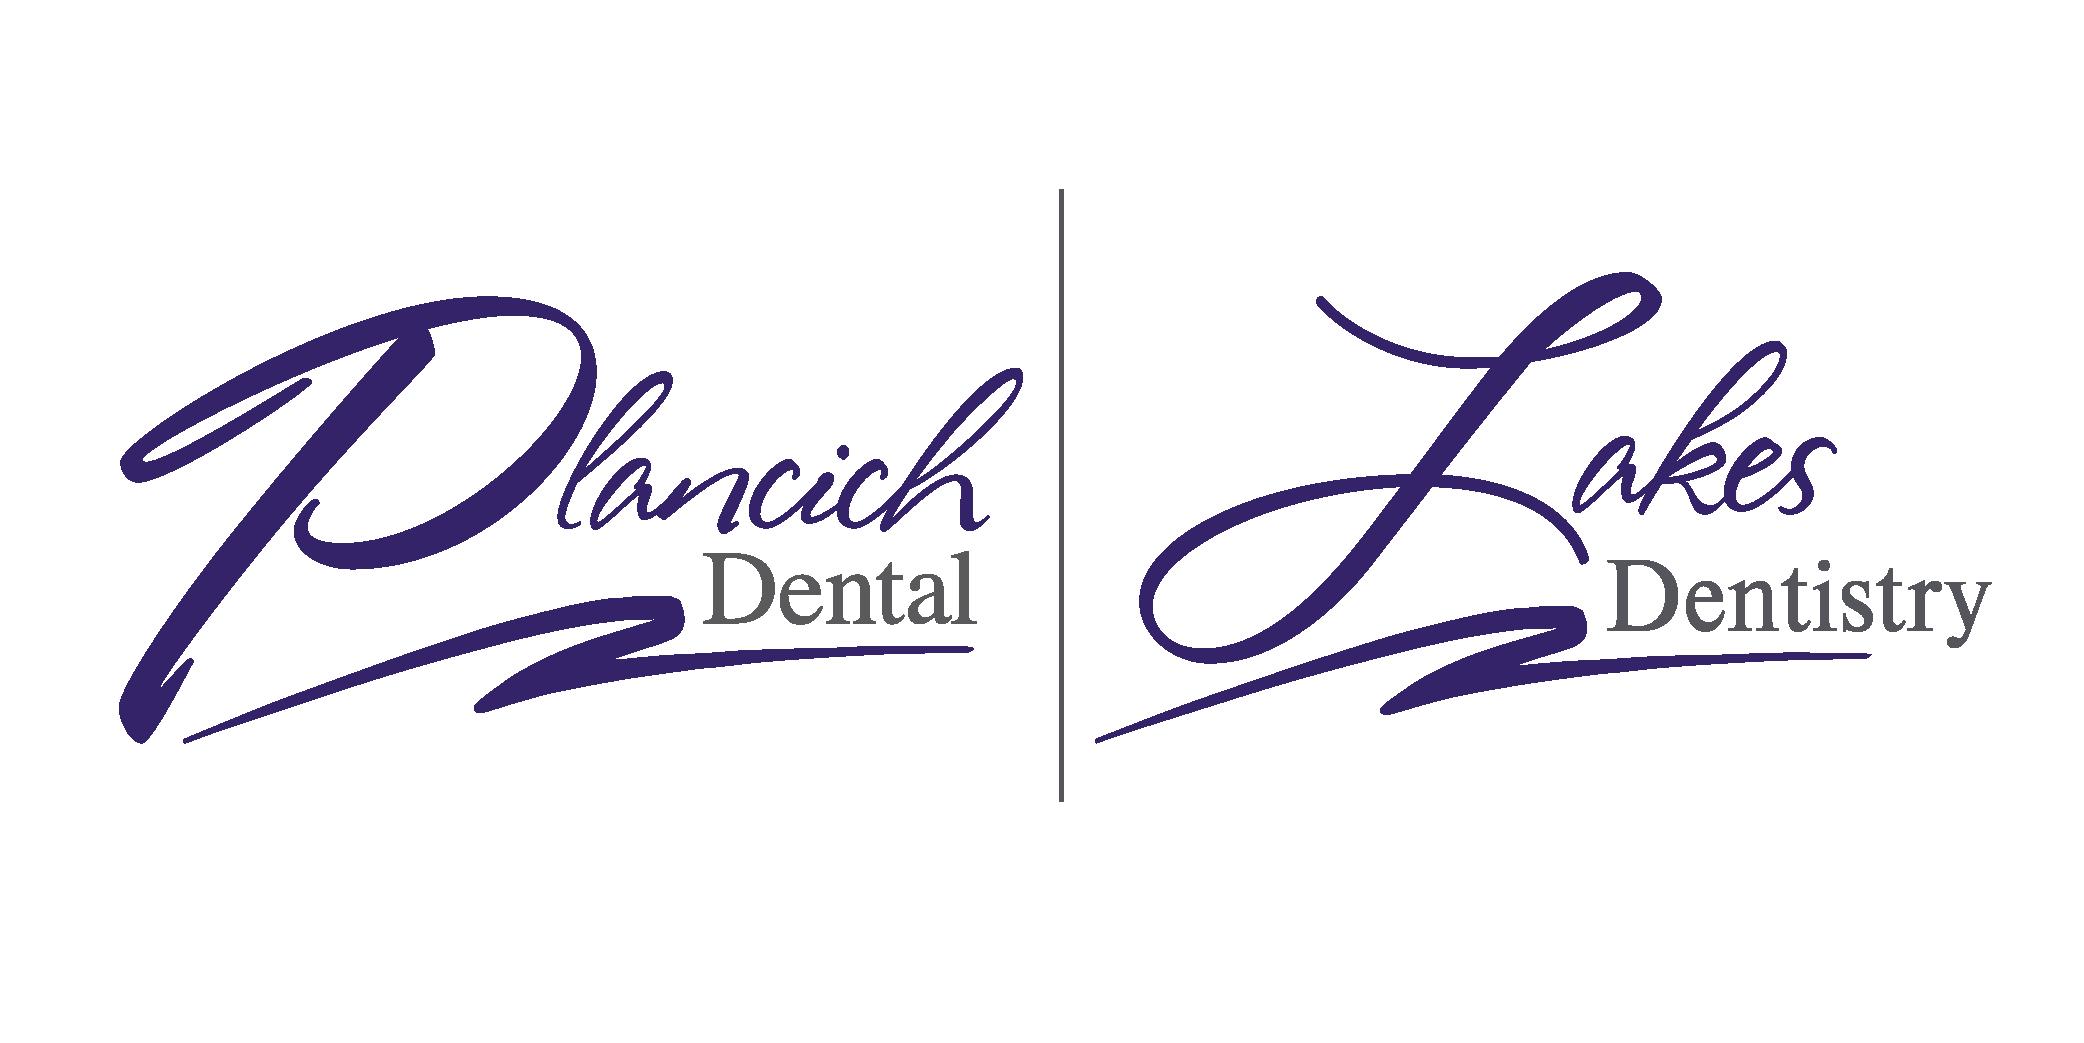 Plancich Dental | Lakes Dentistry